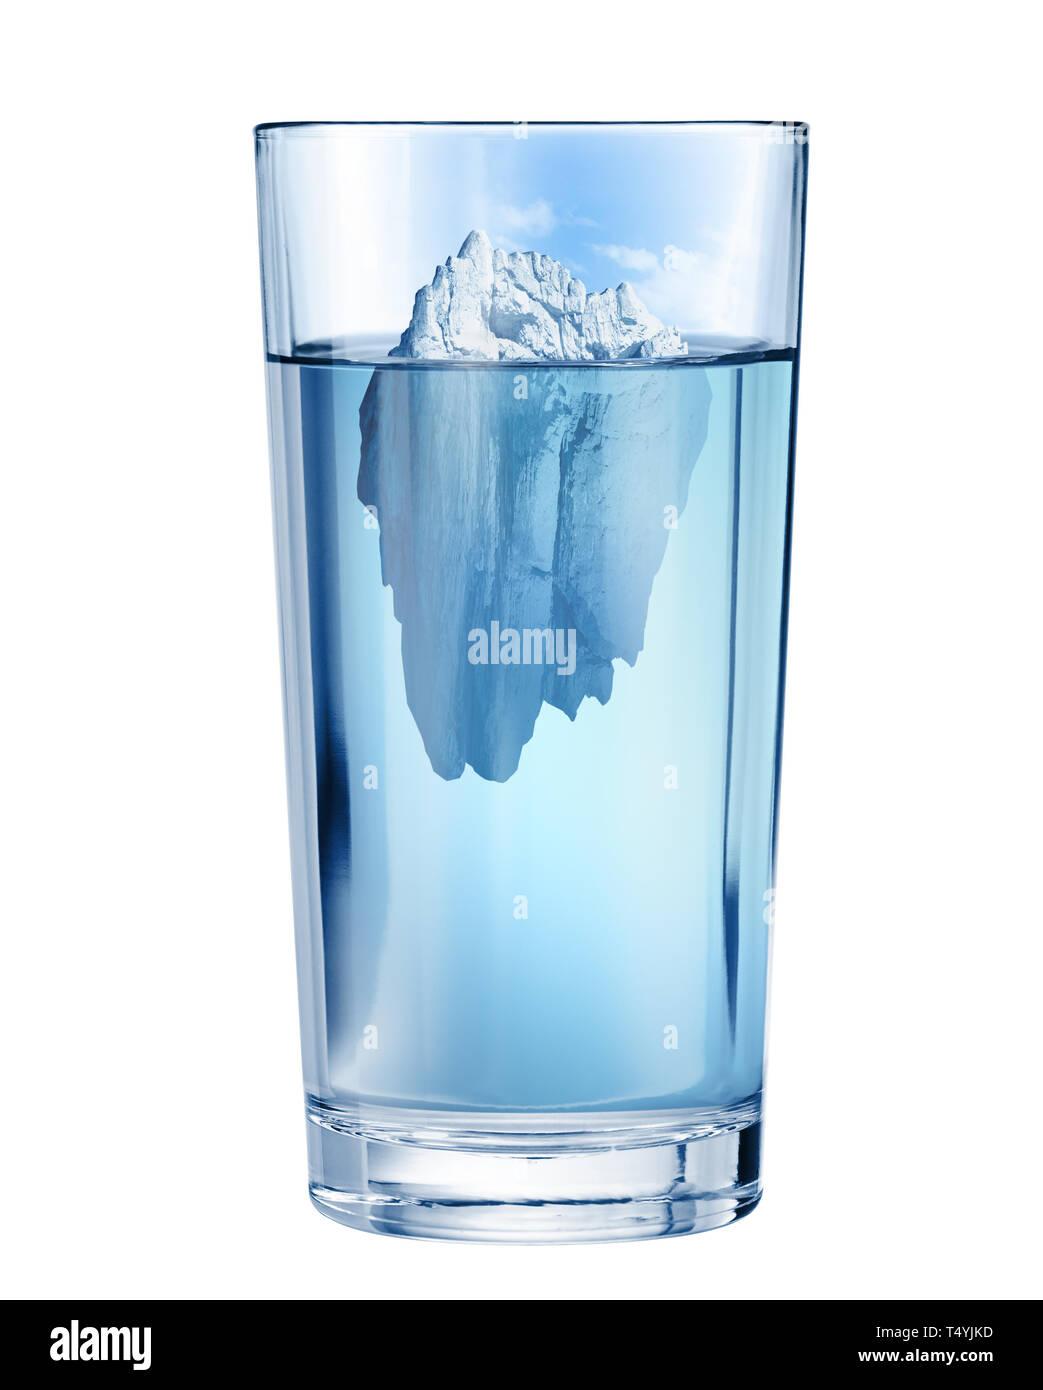 Iceberg in ocean as hidden threat concept - Stock Image